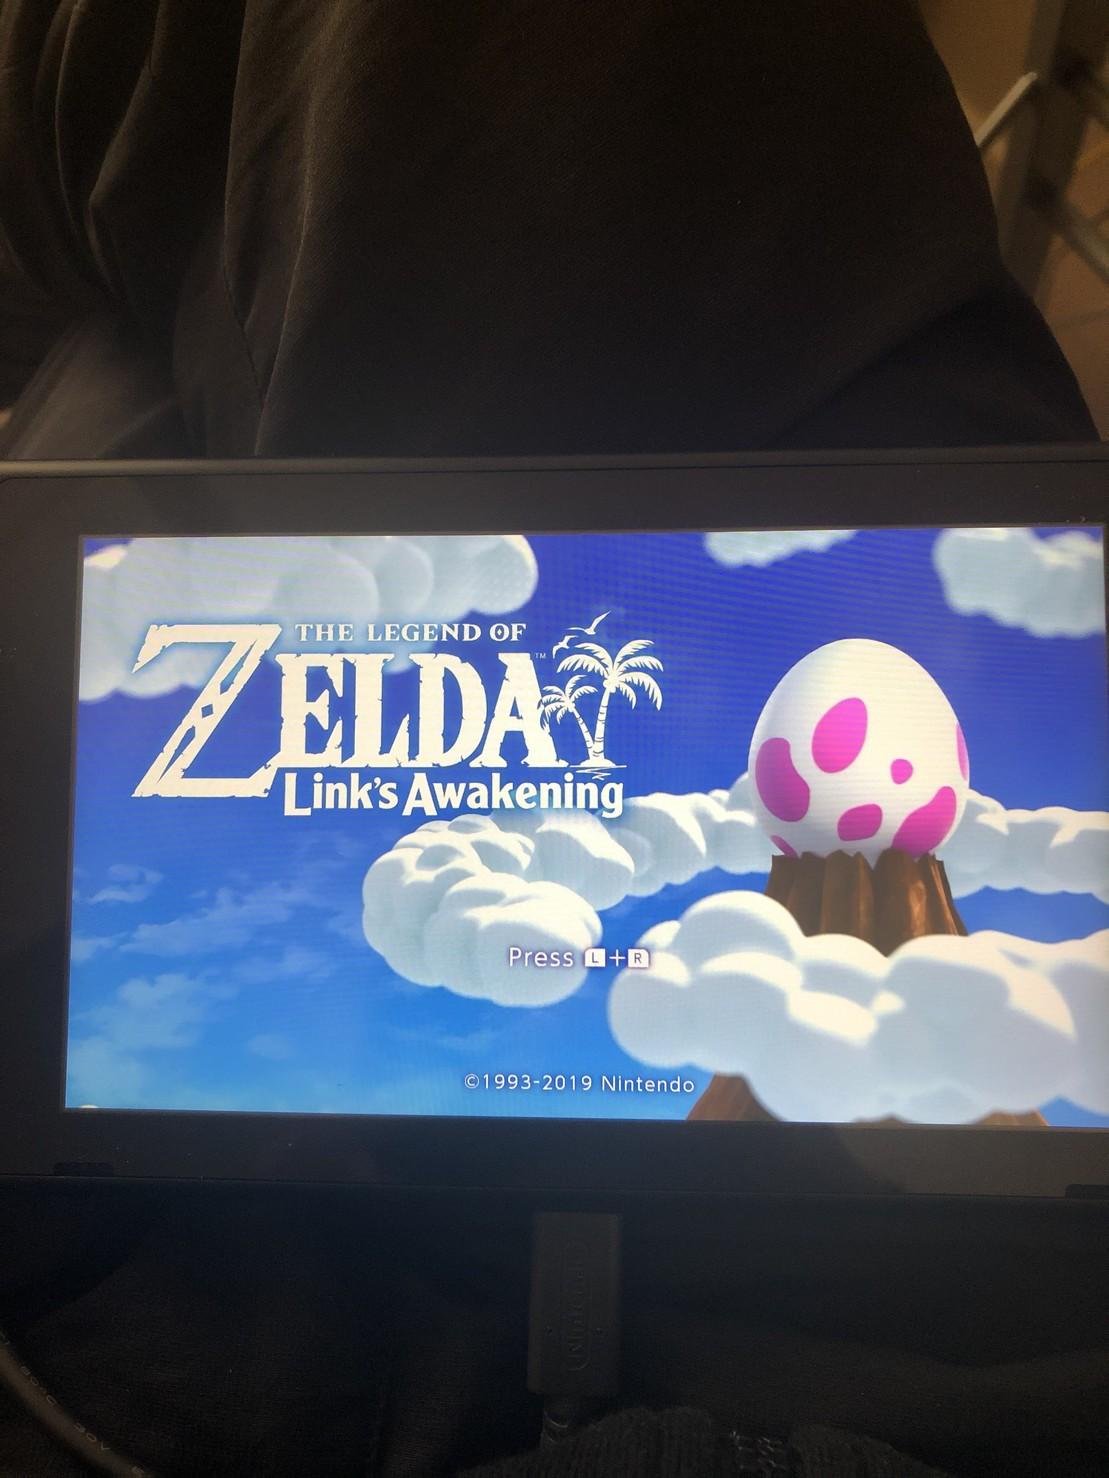 The Legend of Zelda: Link's Awakening screenshot (it really rocks my socks off)